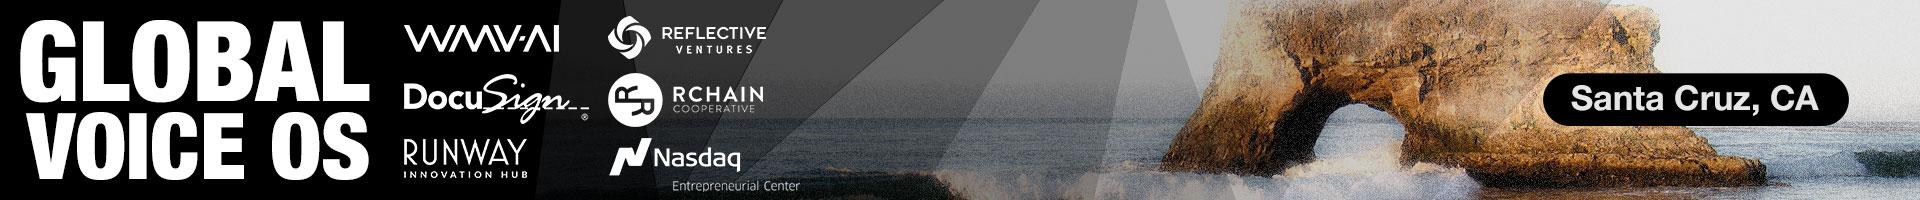 Event-Global-Voice-OS-1920x200-Santa-Cruz-CA